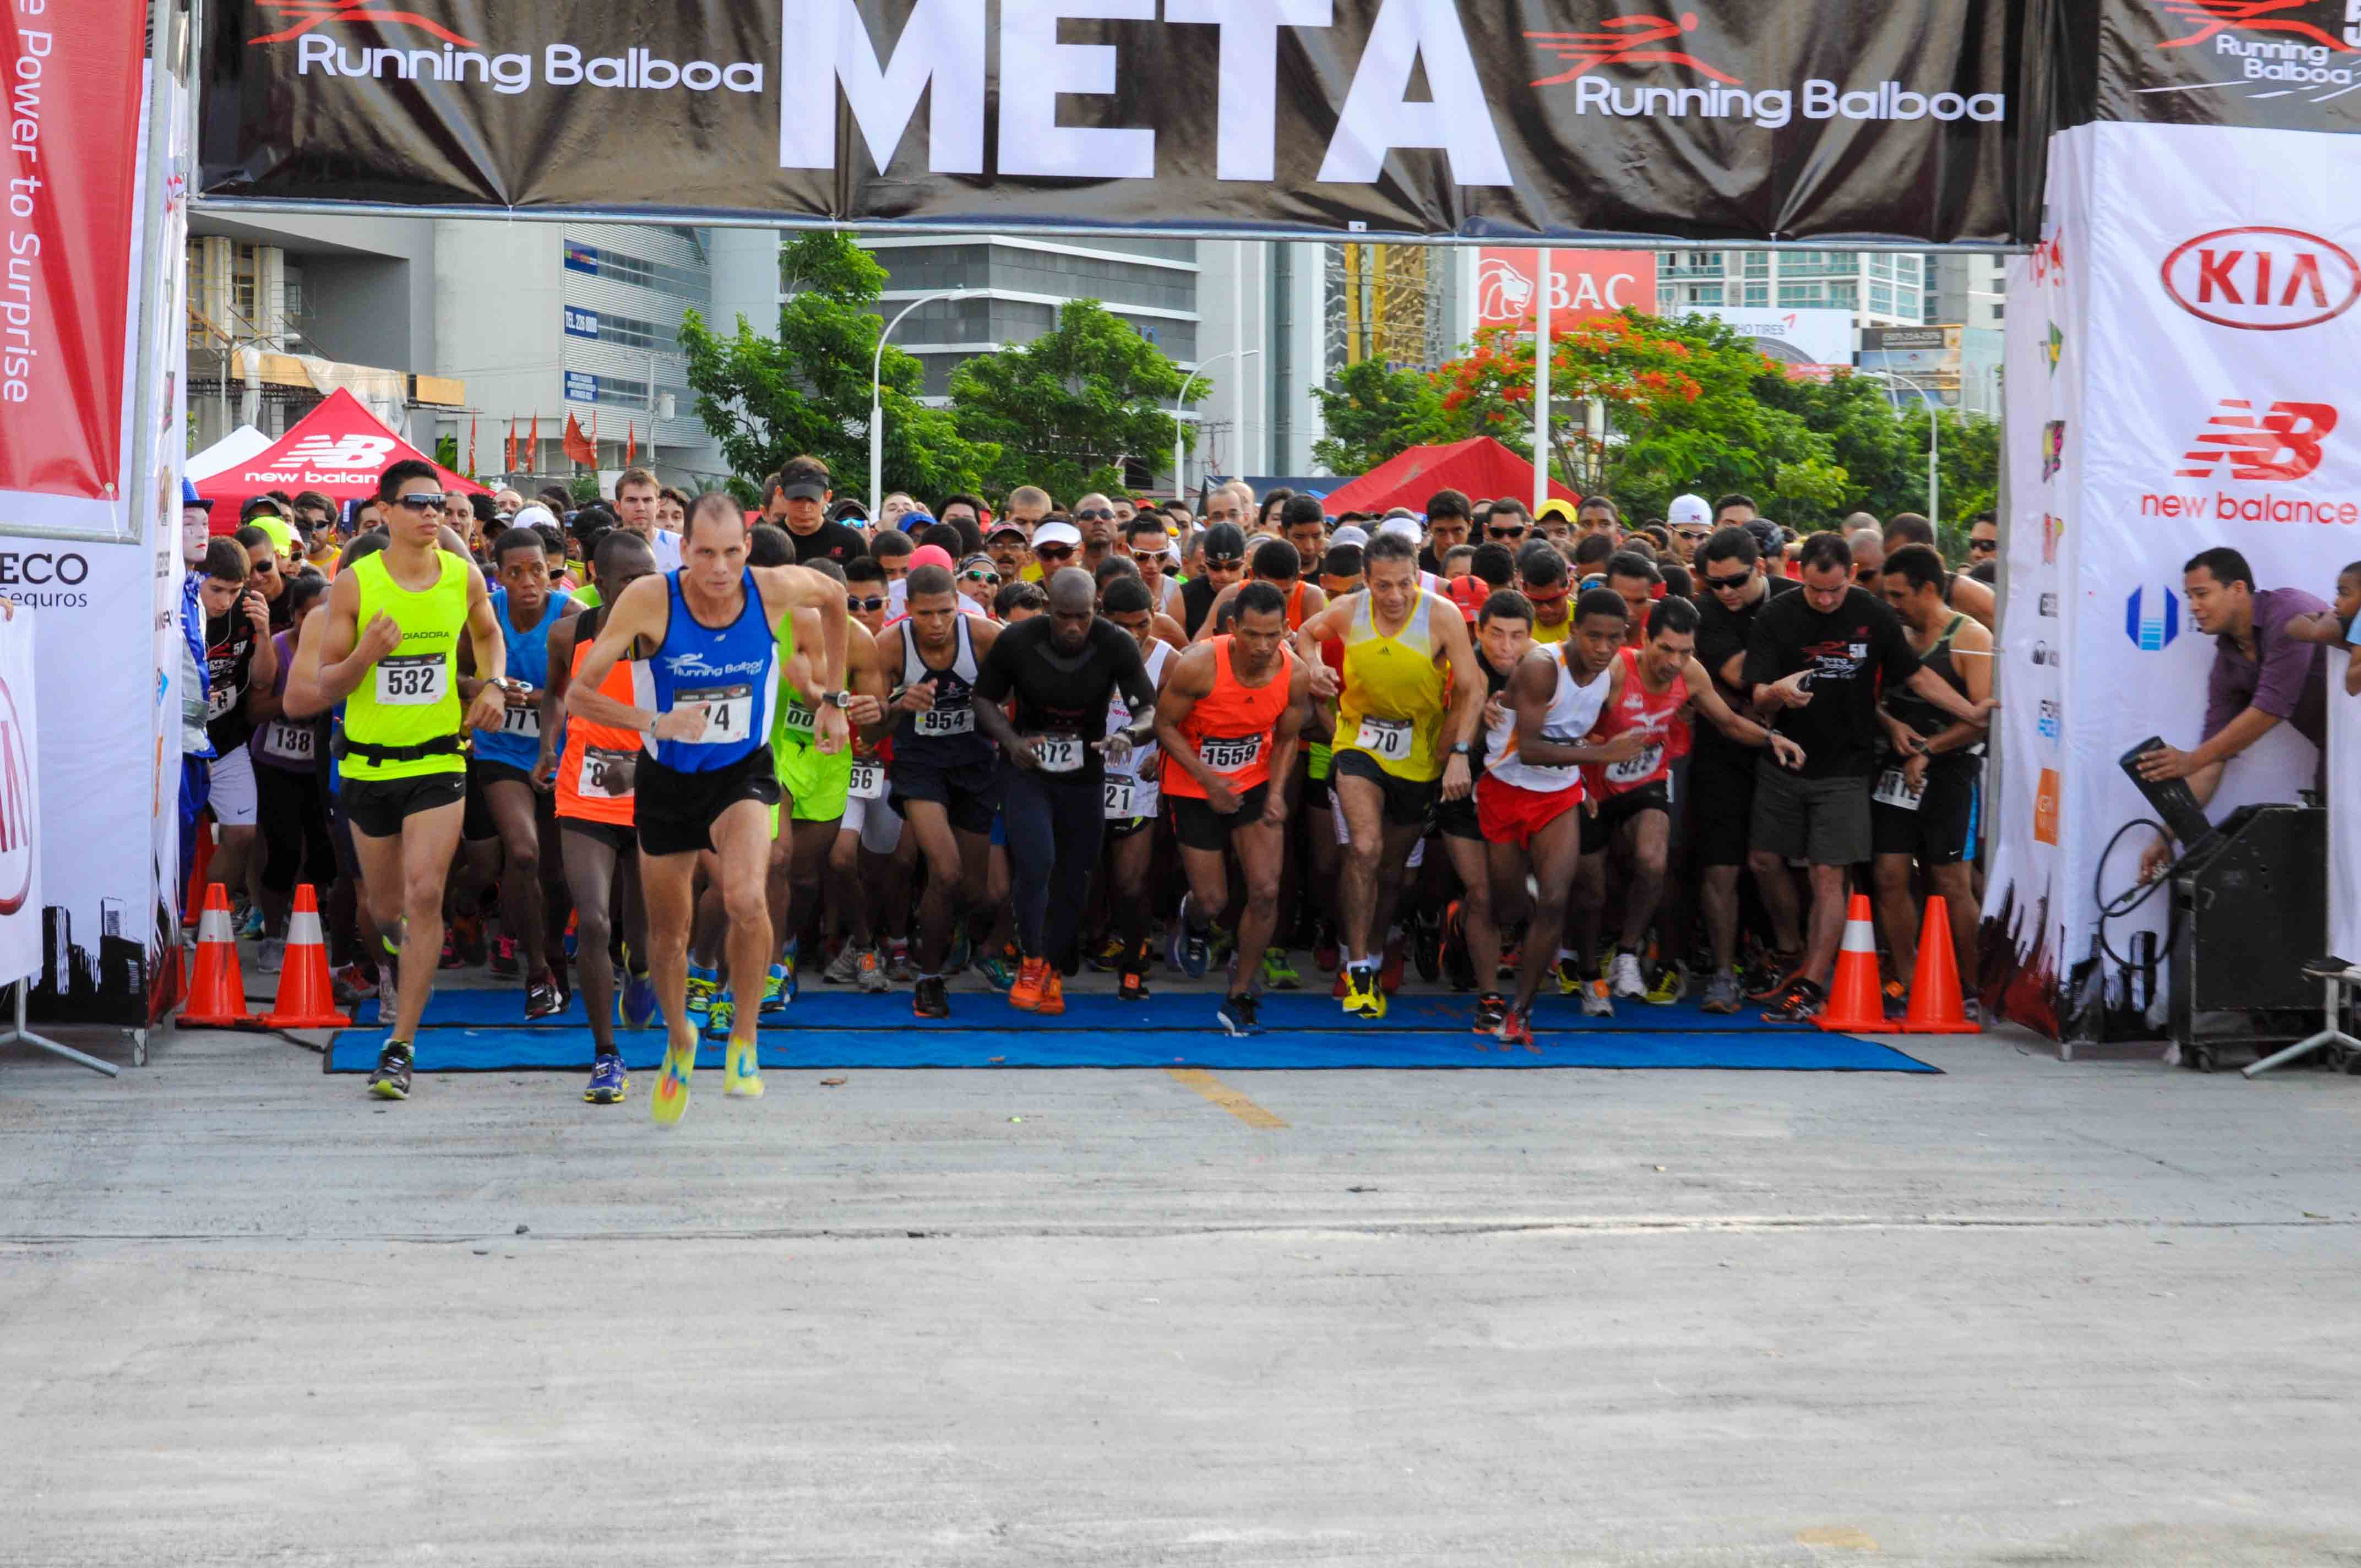 Carrera Caminata 5K 5to Aniversario de Running Balboa PTY